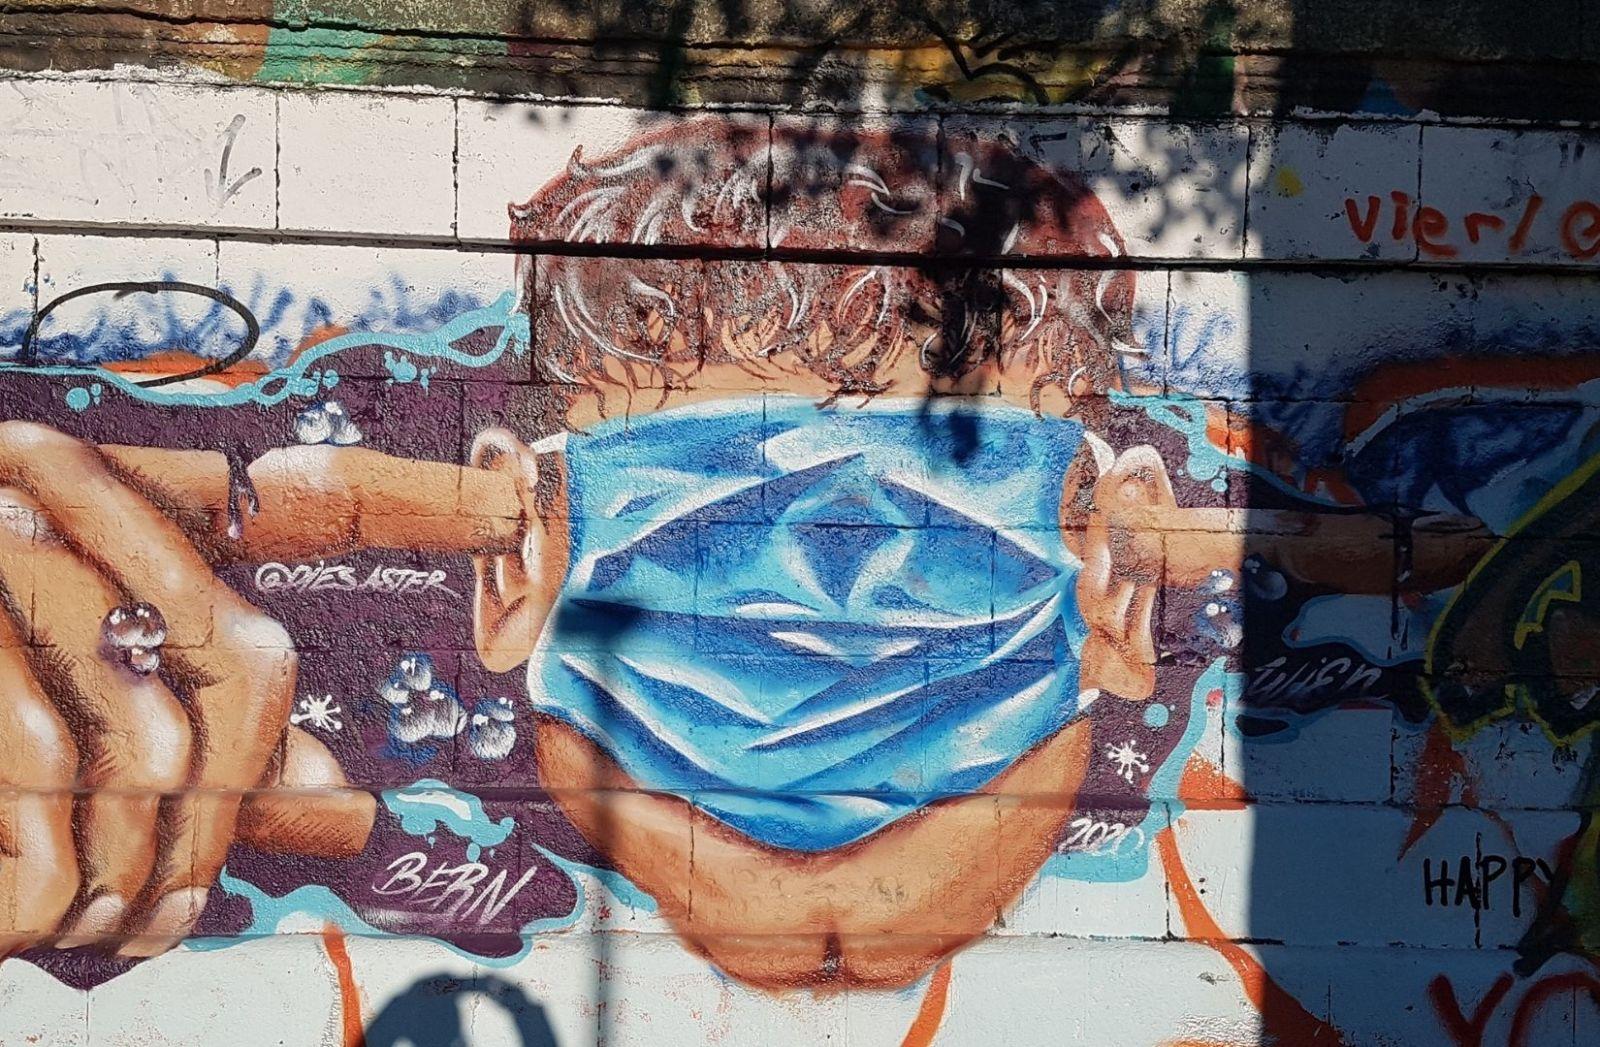 Corona-Demo in Wien und eine Wall Art Symbolwert. (Foto: Franco Arshak)